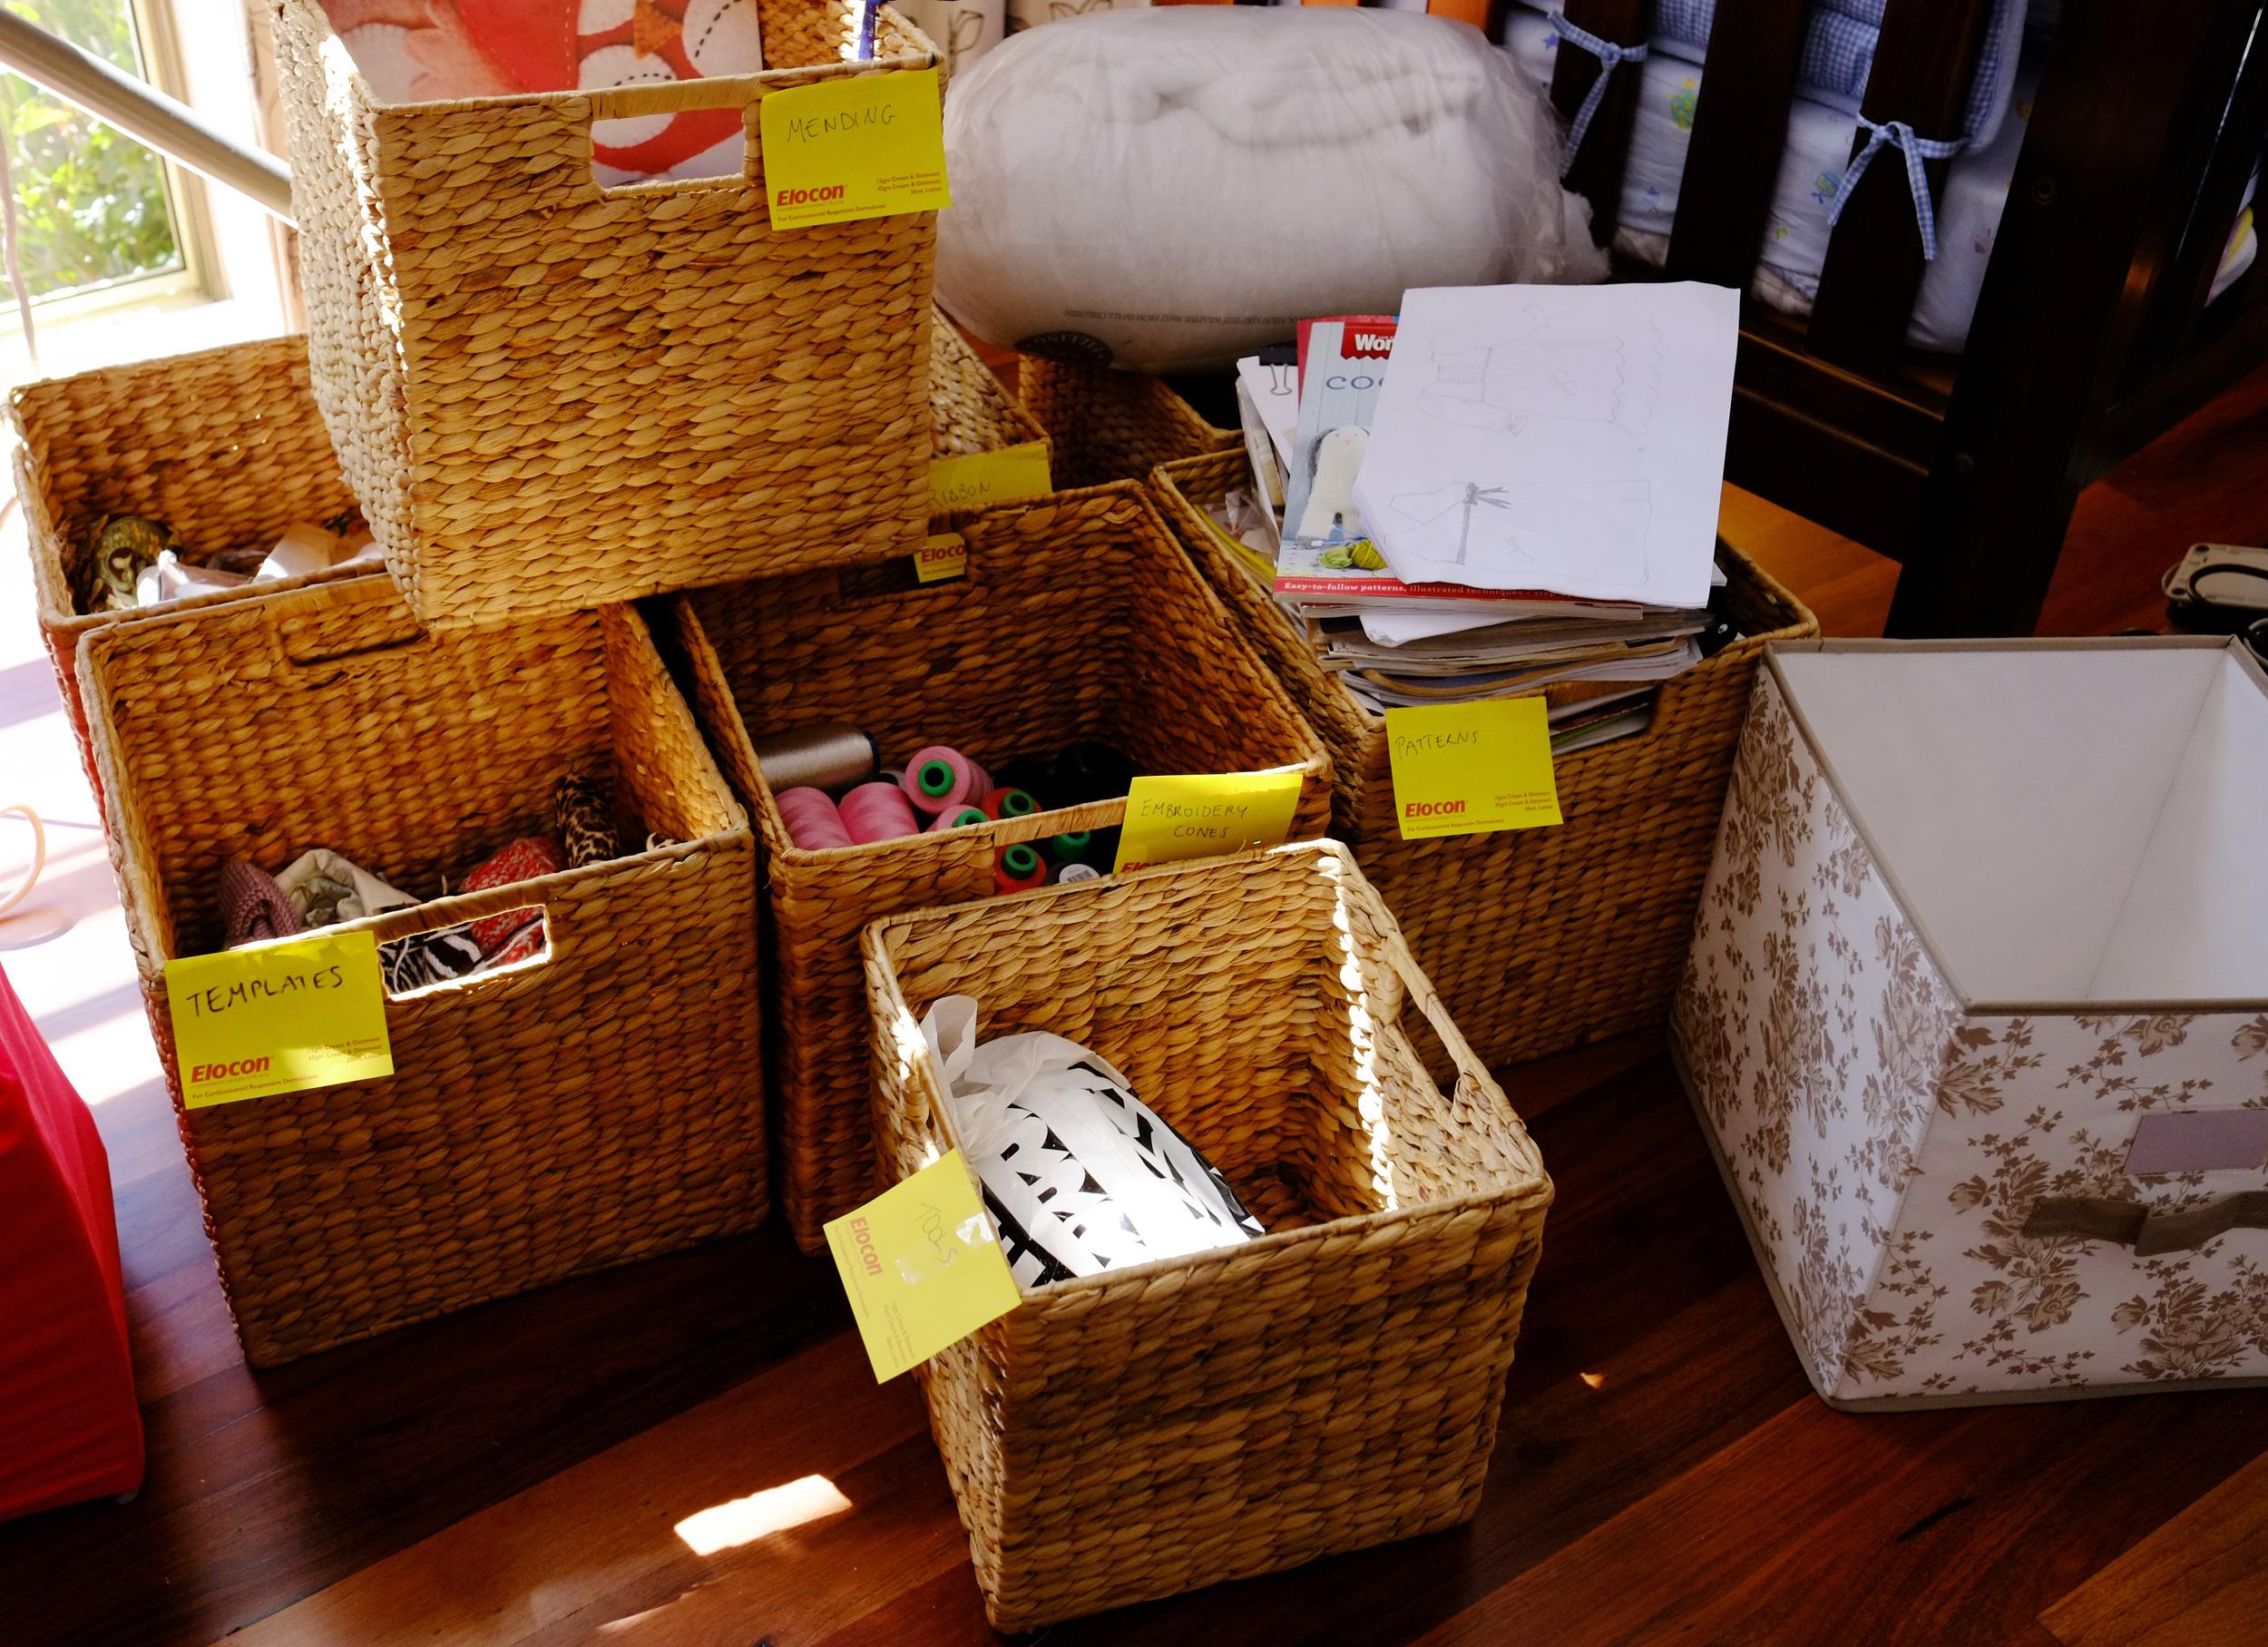 sorting baskets